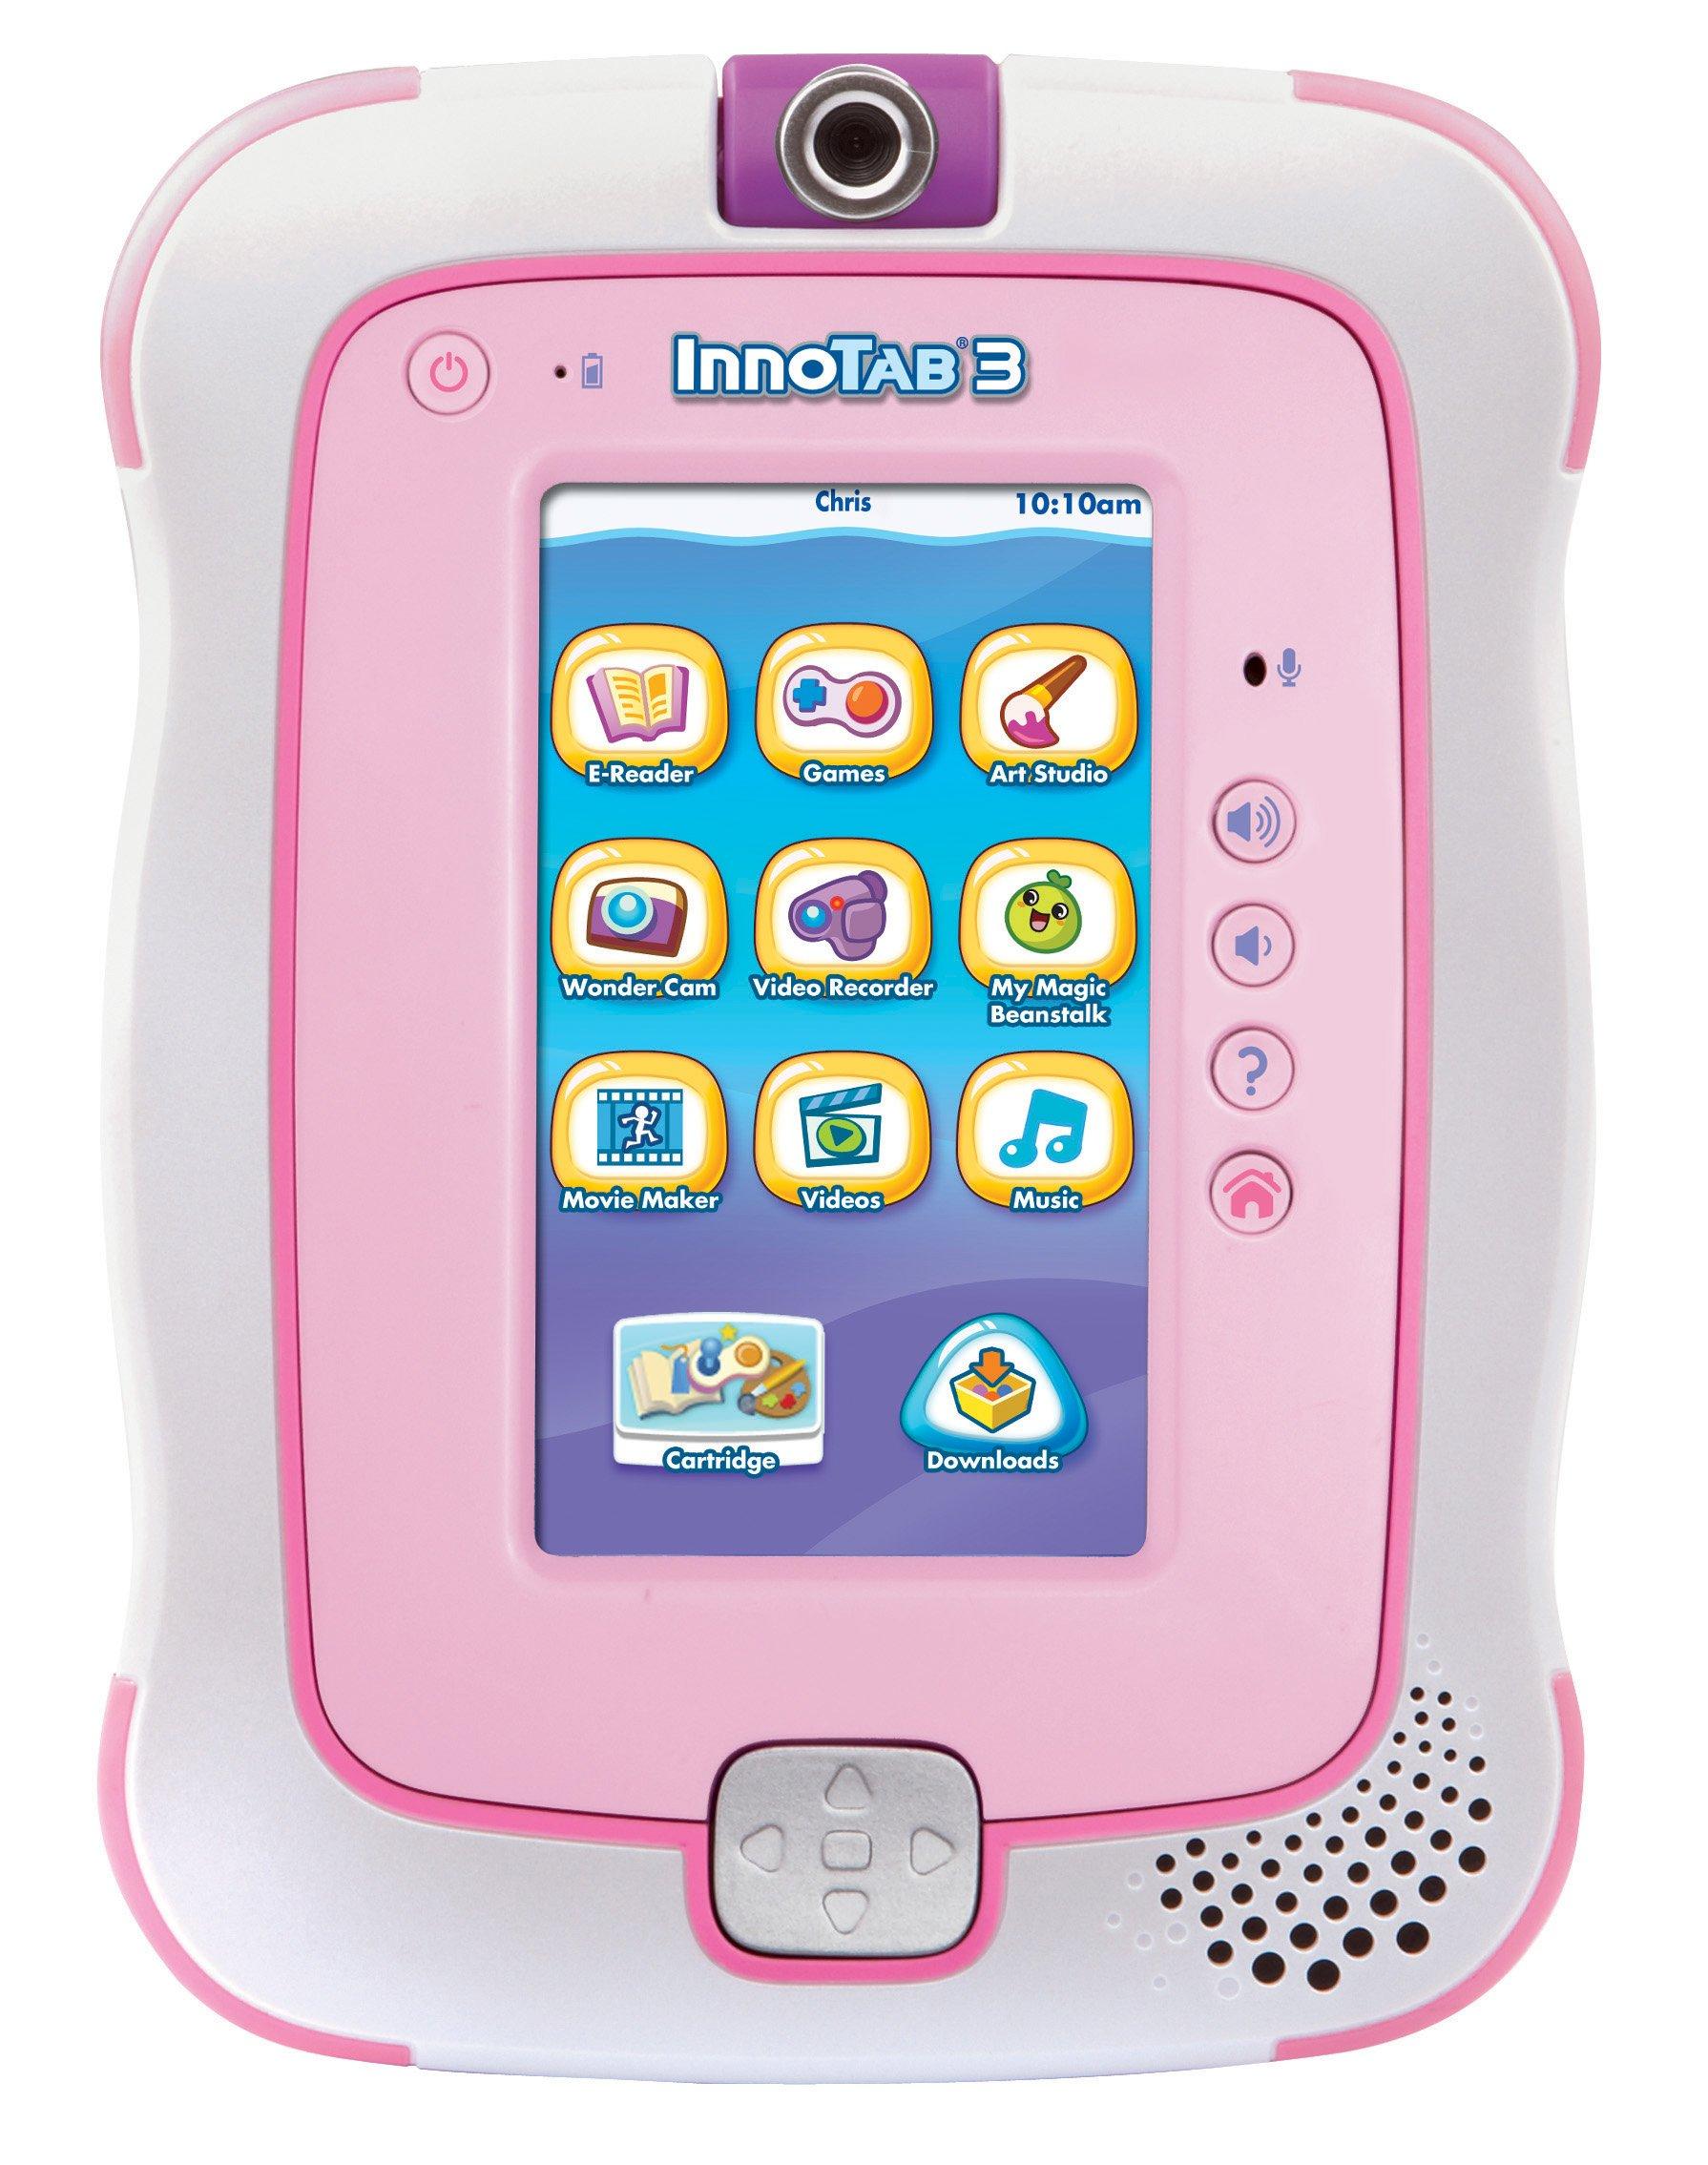 VTech InnoTab 3 Plus Kids Tablet, Pink by VTech (Image #1)